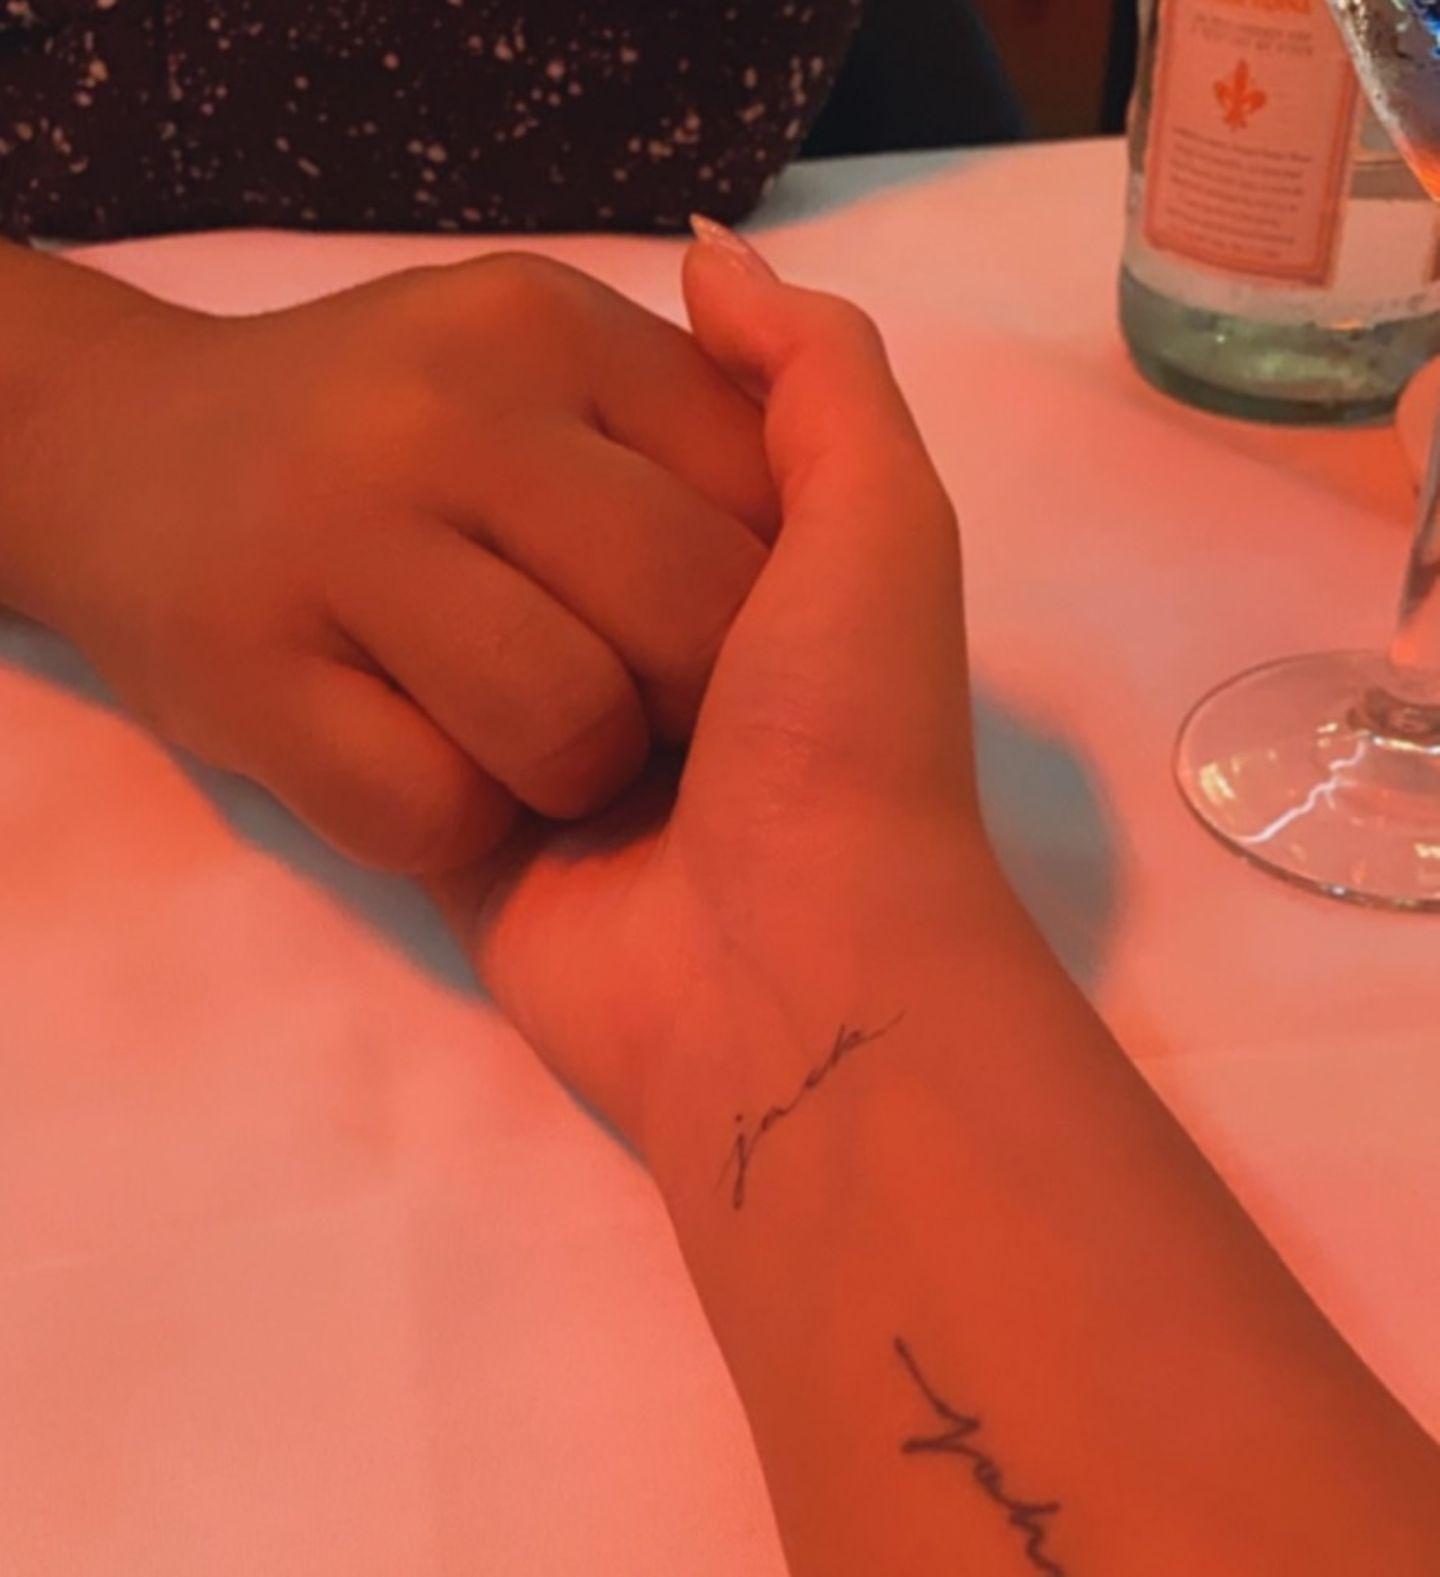 Vip News: Chrissy Teigen erinnert mit Tattoo an verstorbenen Sohn